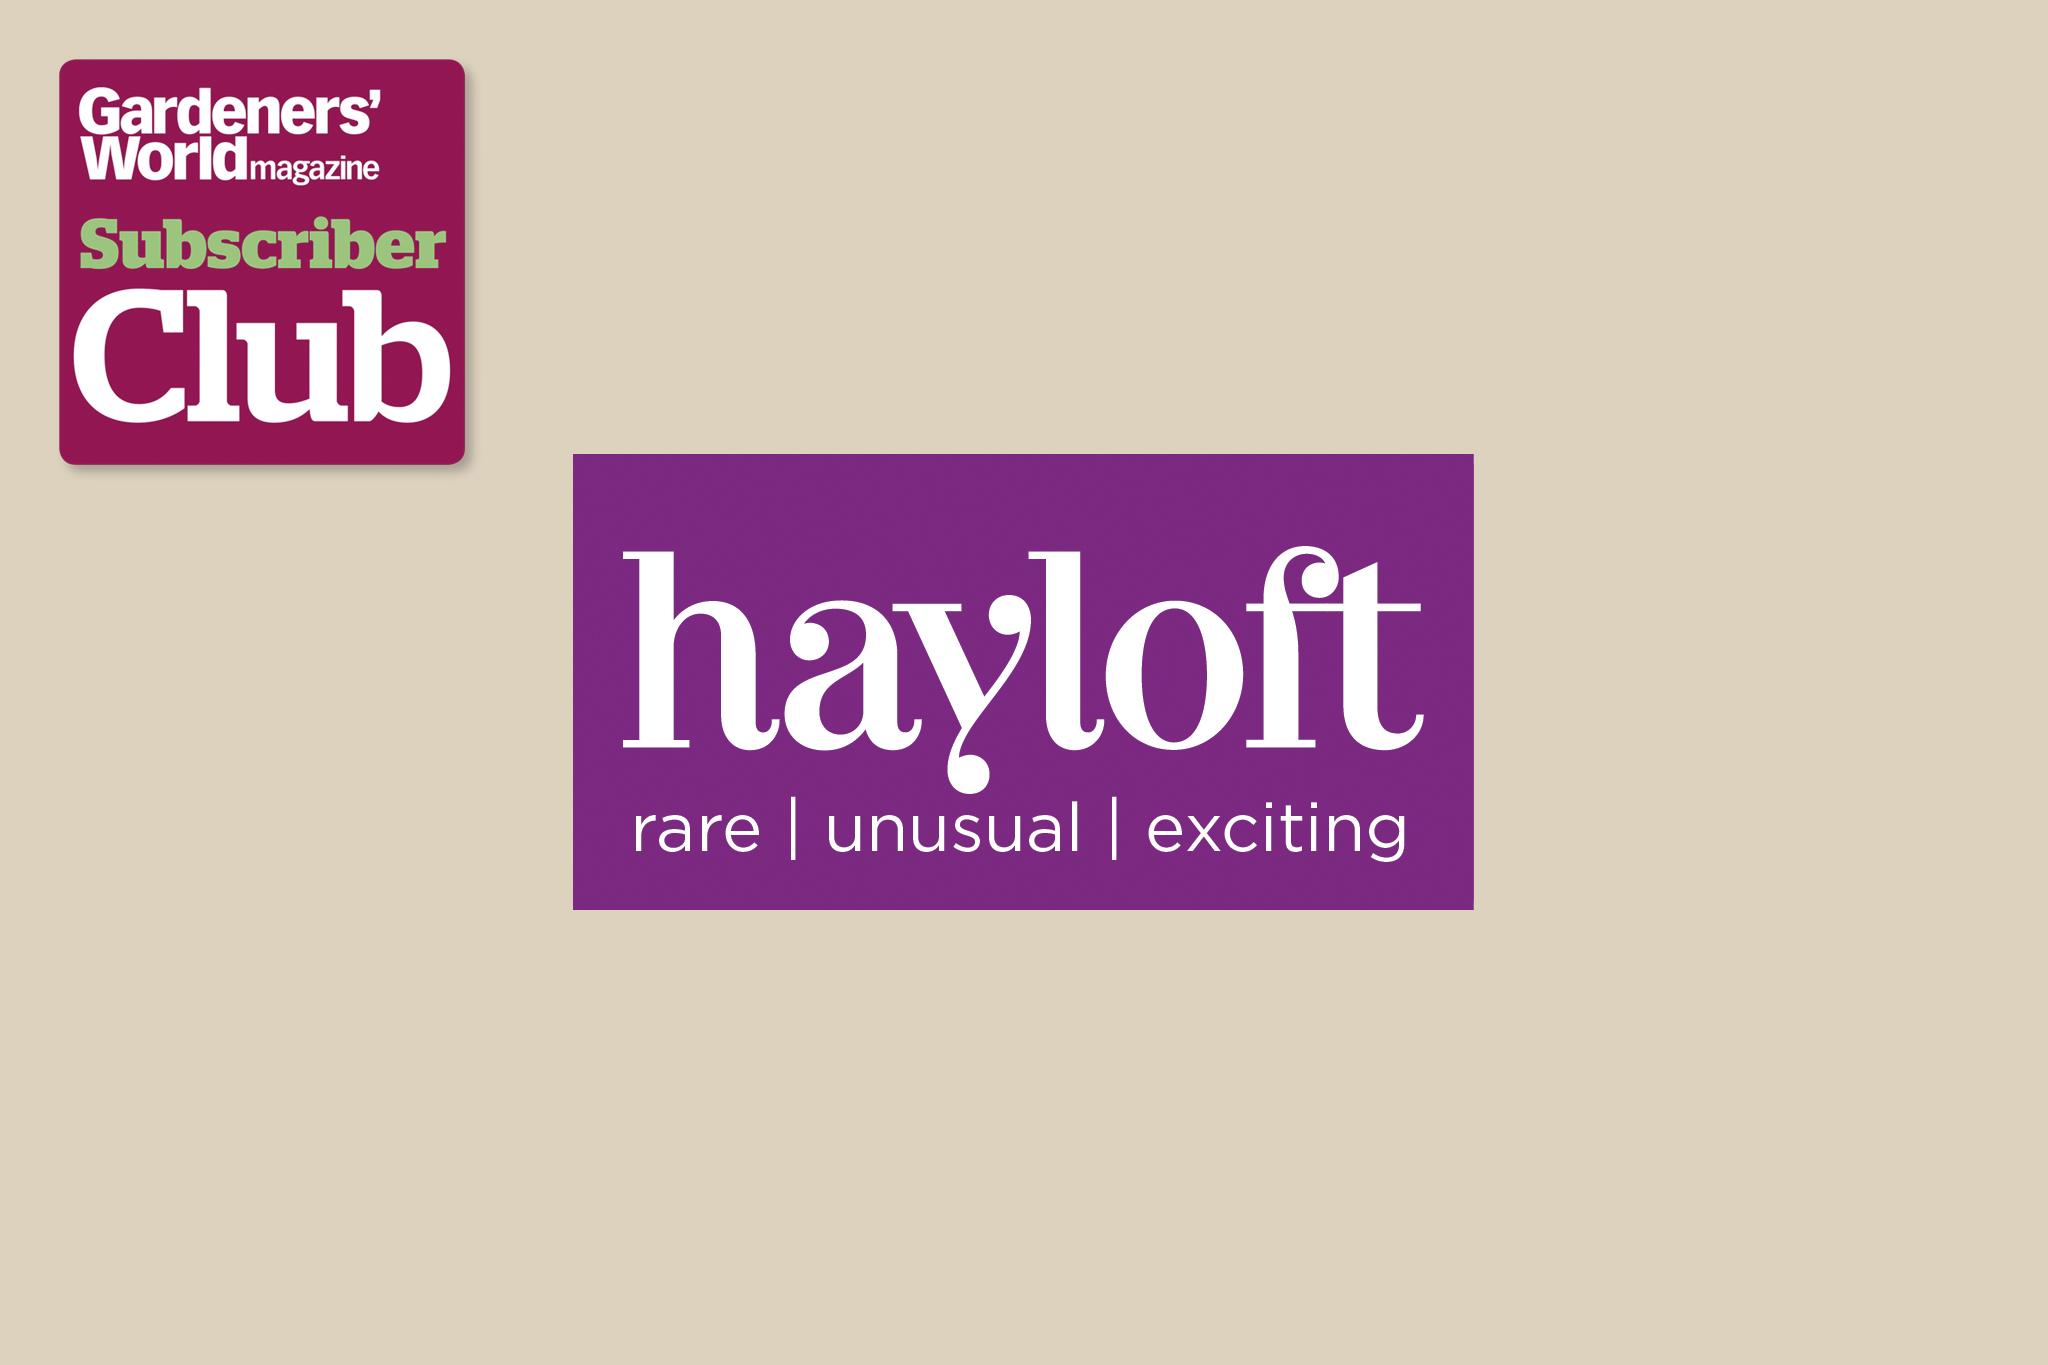 Hayloft BBC Gardeners' World Magazine Subscriber Club discount